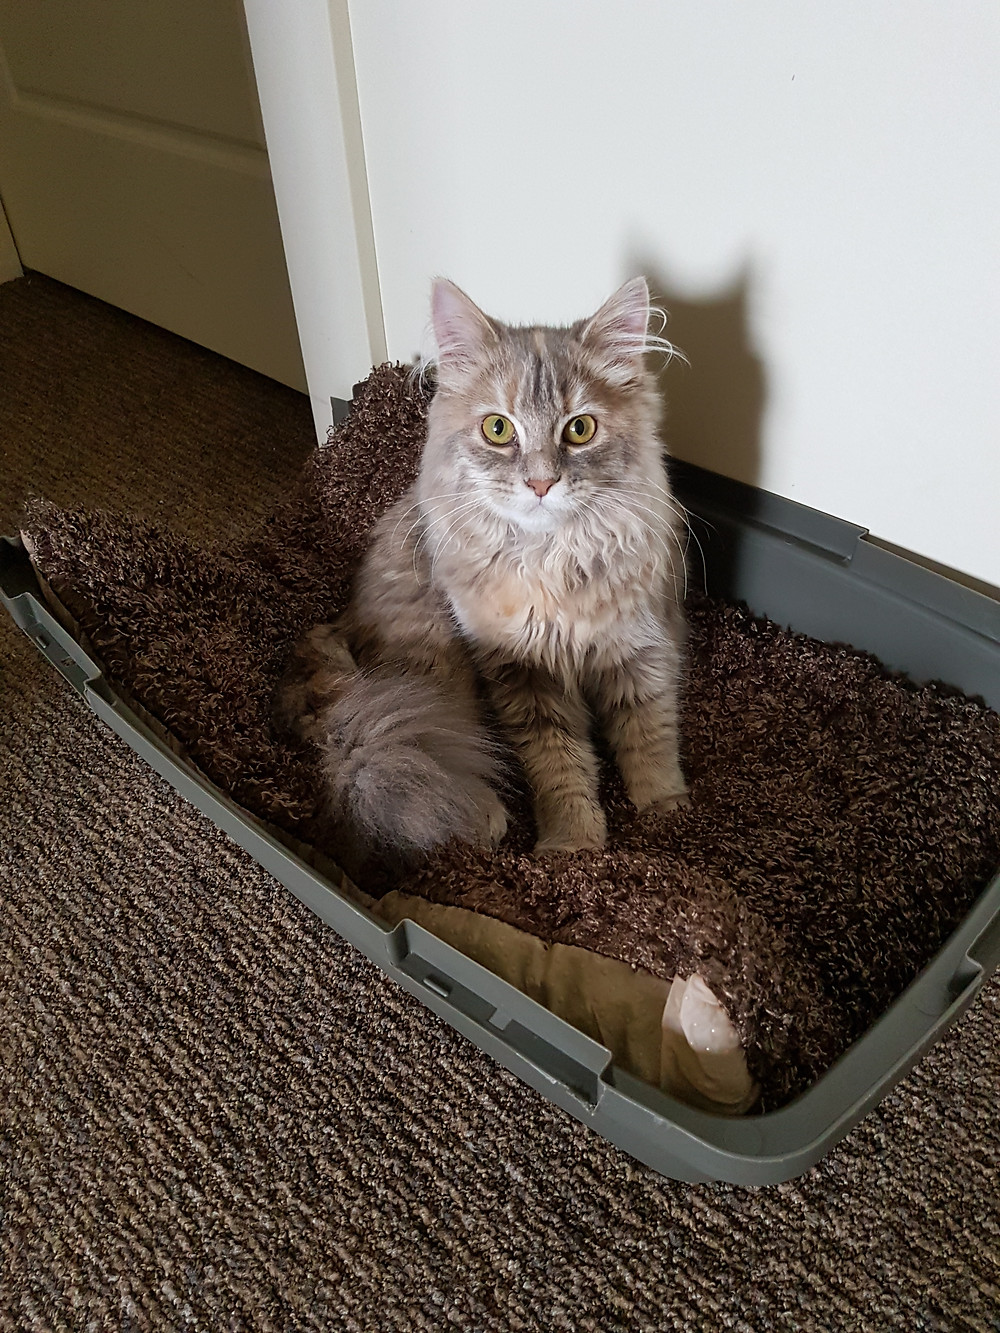 Arry (Aria) my kitty cat